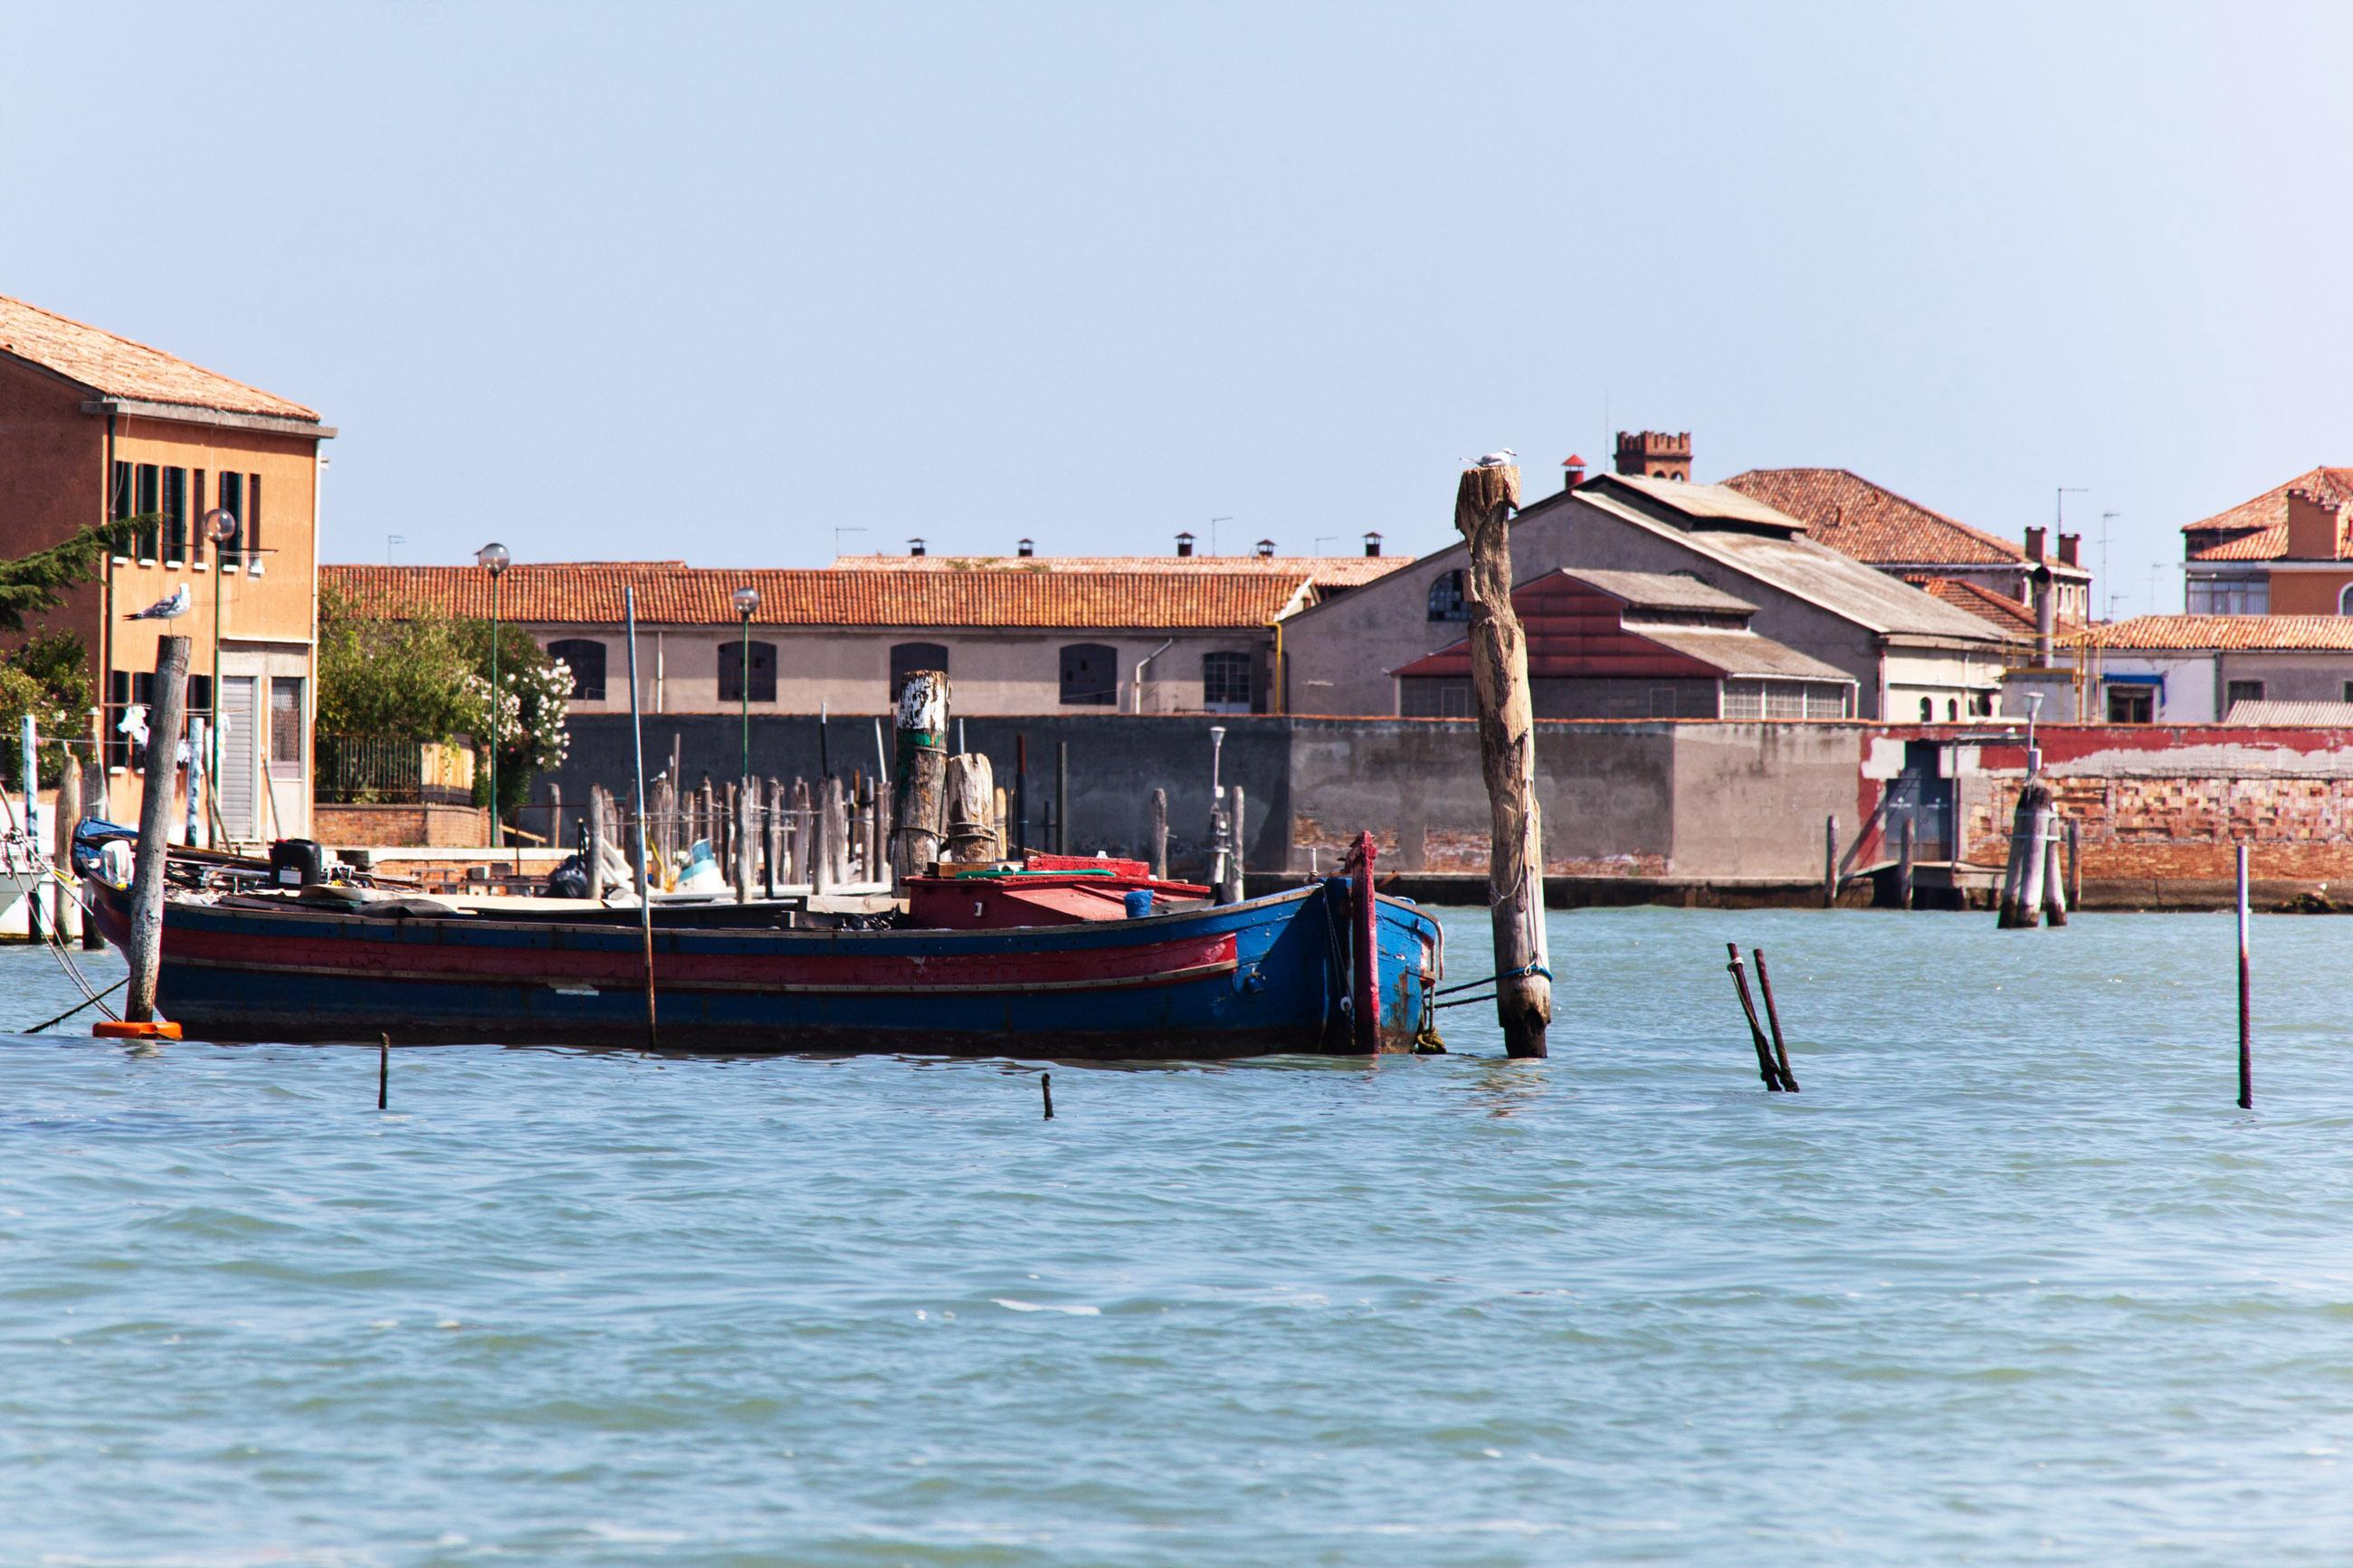 Boats moored in venice, italy photo